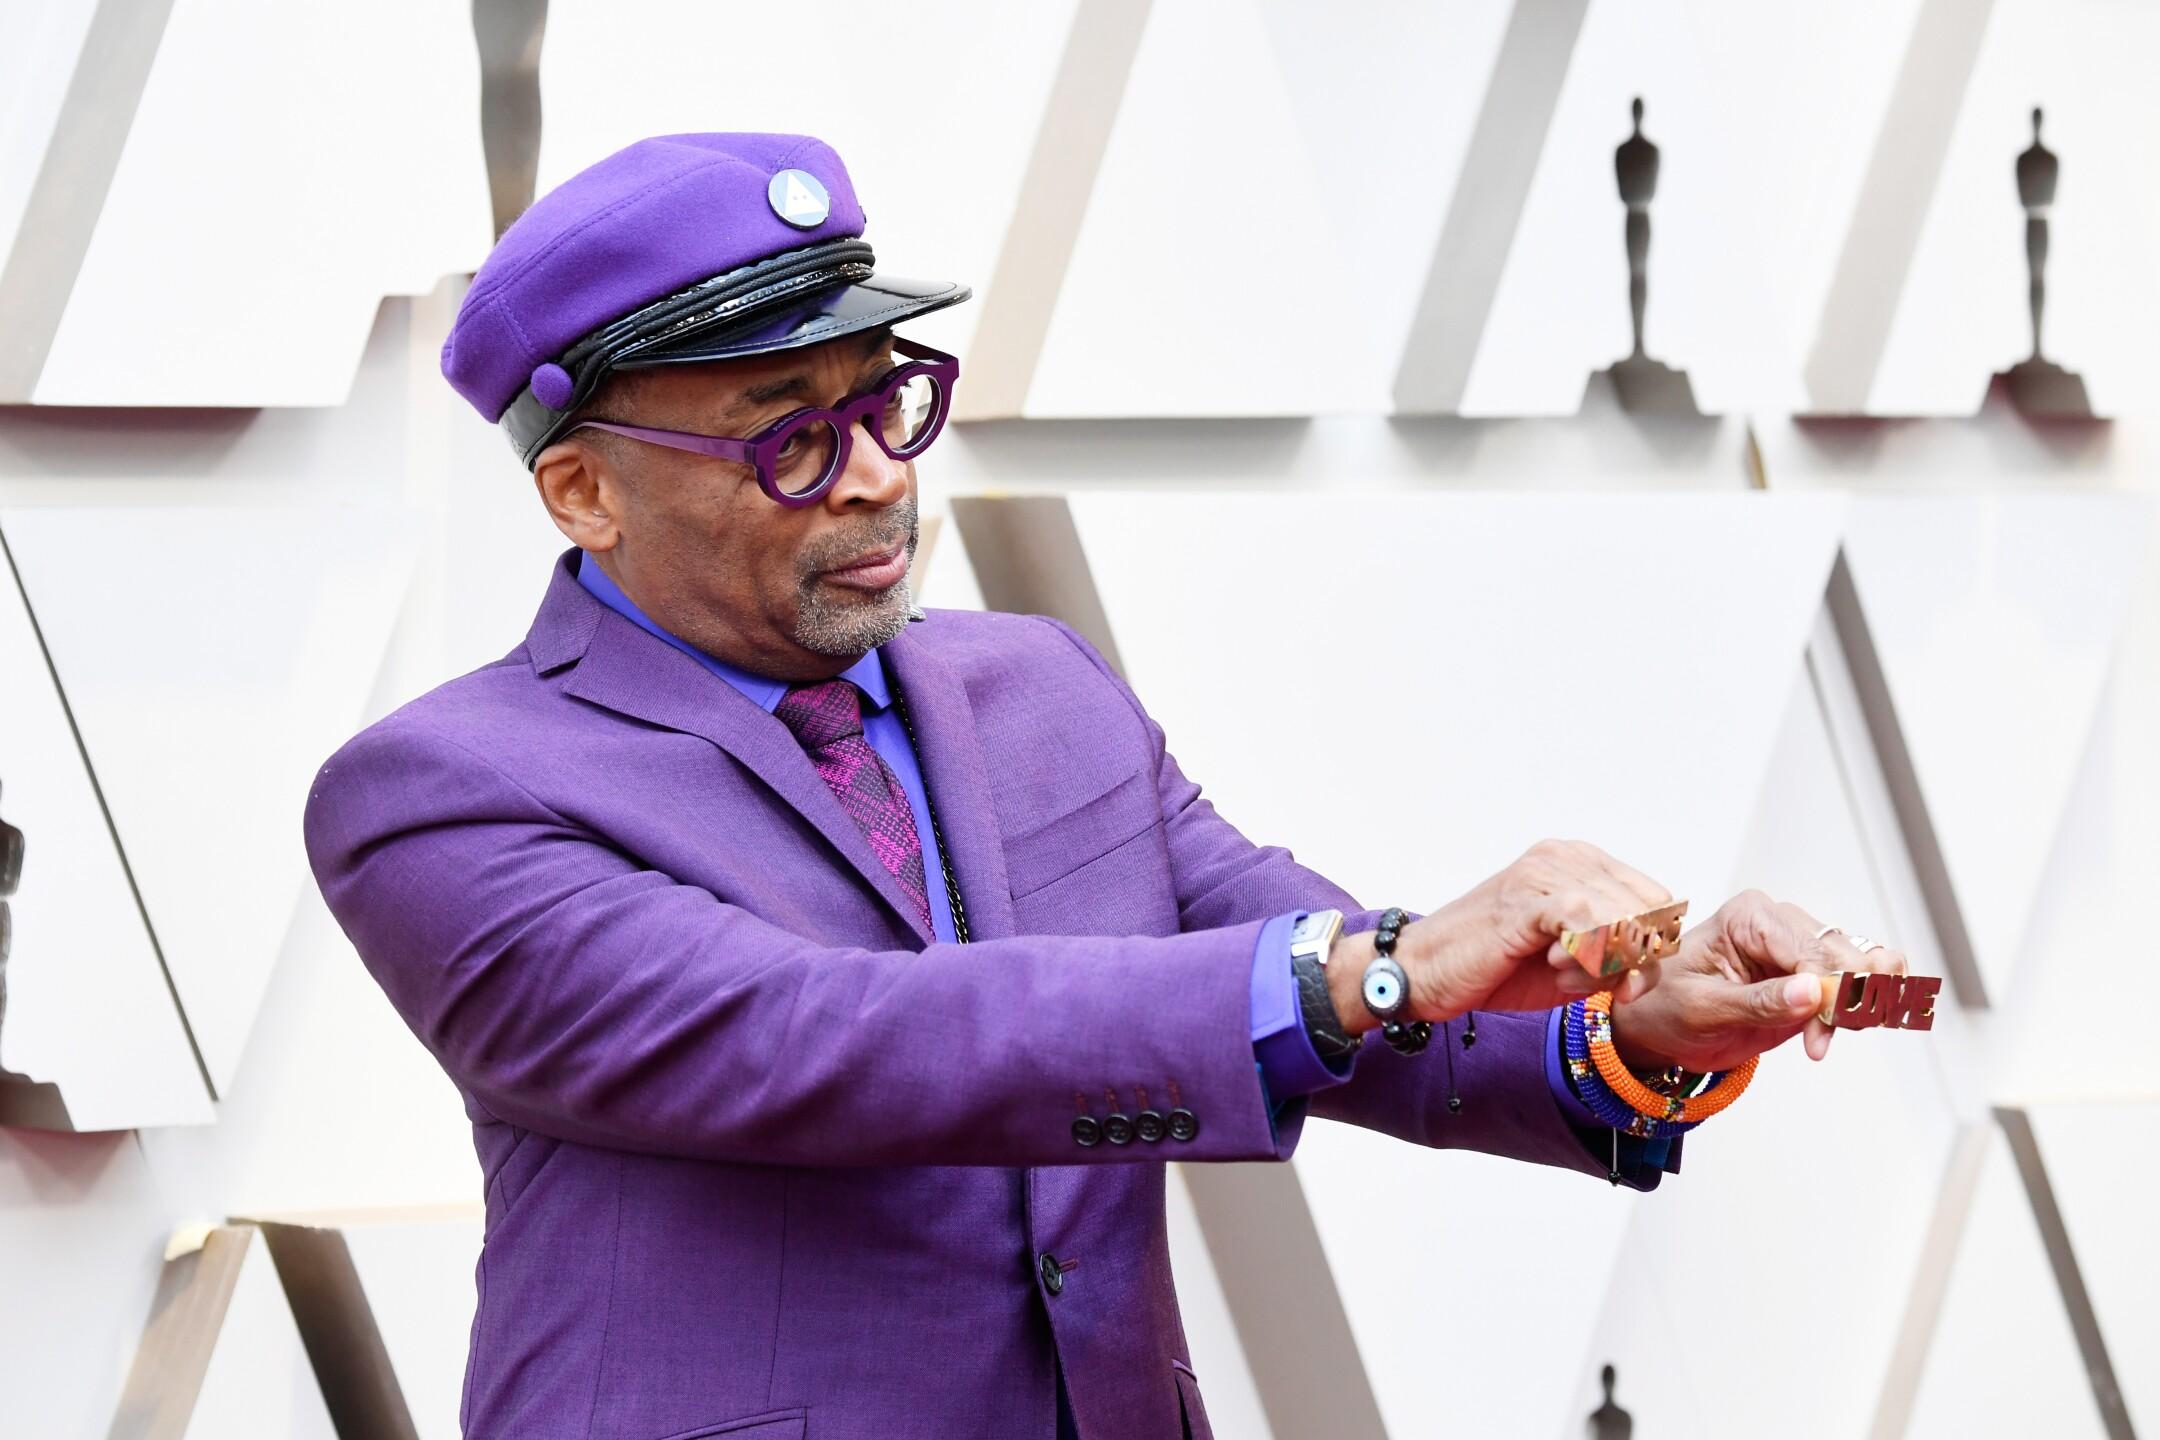 Oscars 2019: Stars arrive on red carpet for the 91st Academy Awards